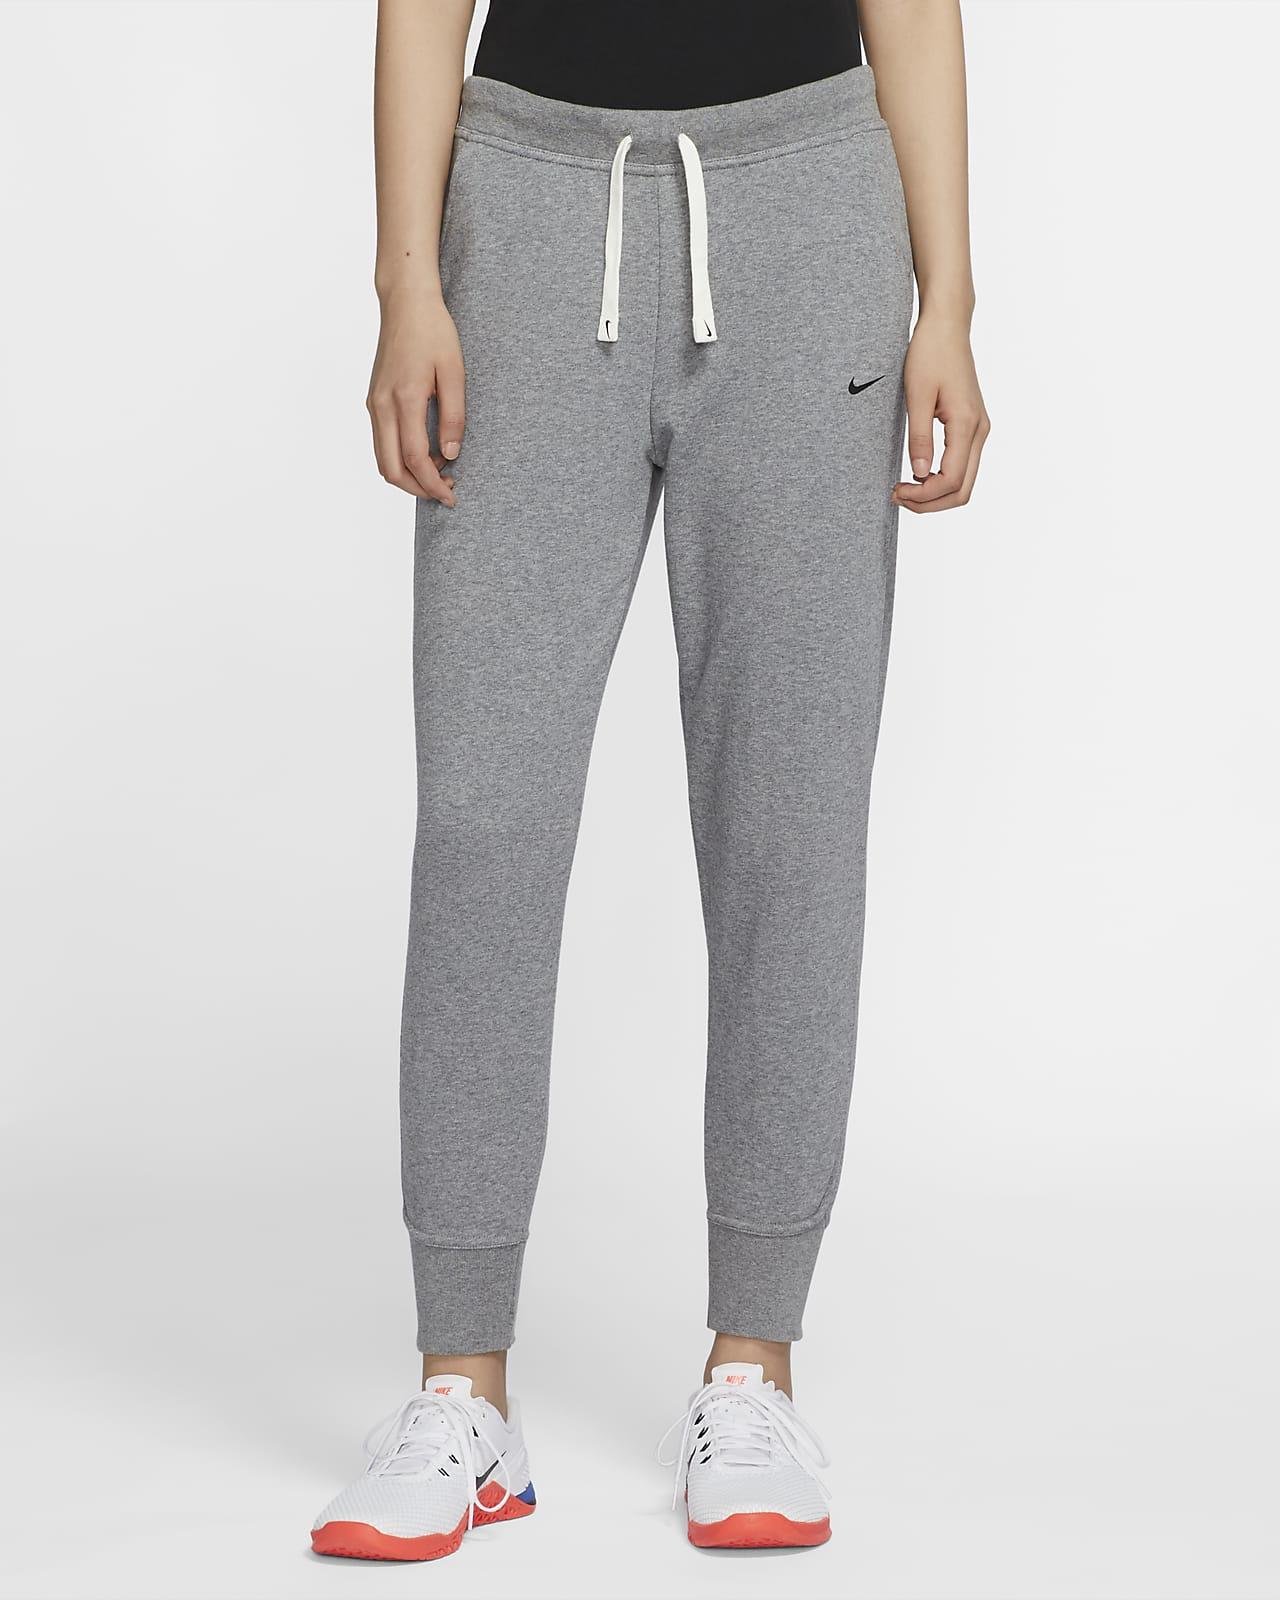 Pantaloni da training Nike Dri-FIT Get Fit - Donna